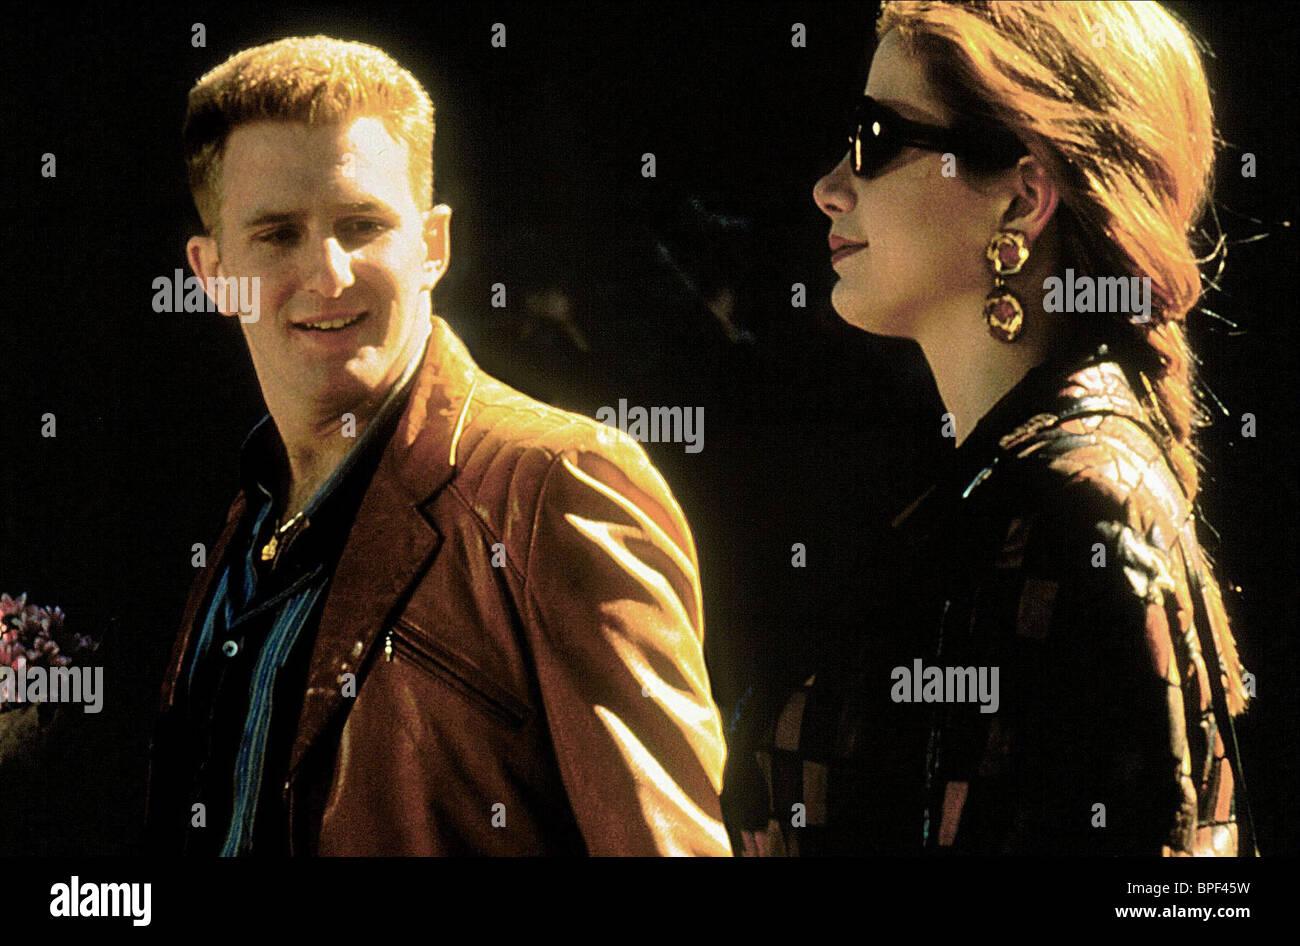 MICHAEL RAPAPORT, MIRA SORVINO, MIGHTY APHRODITE, 1995 - Stock Image